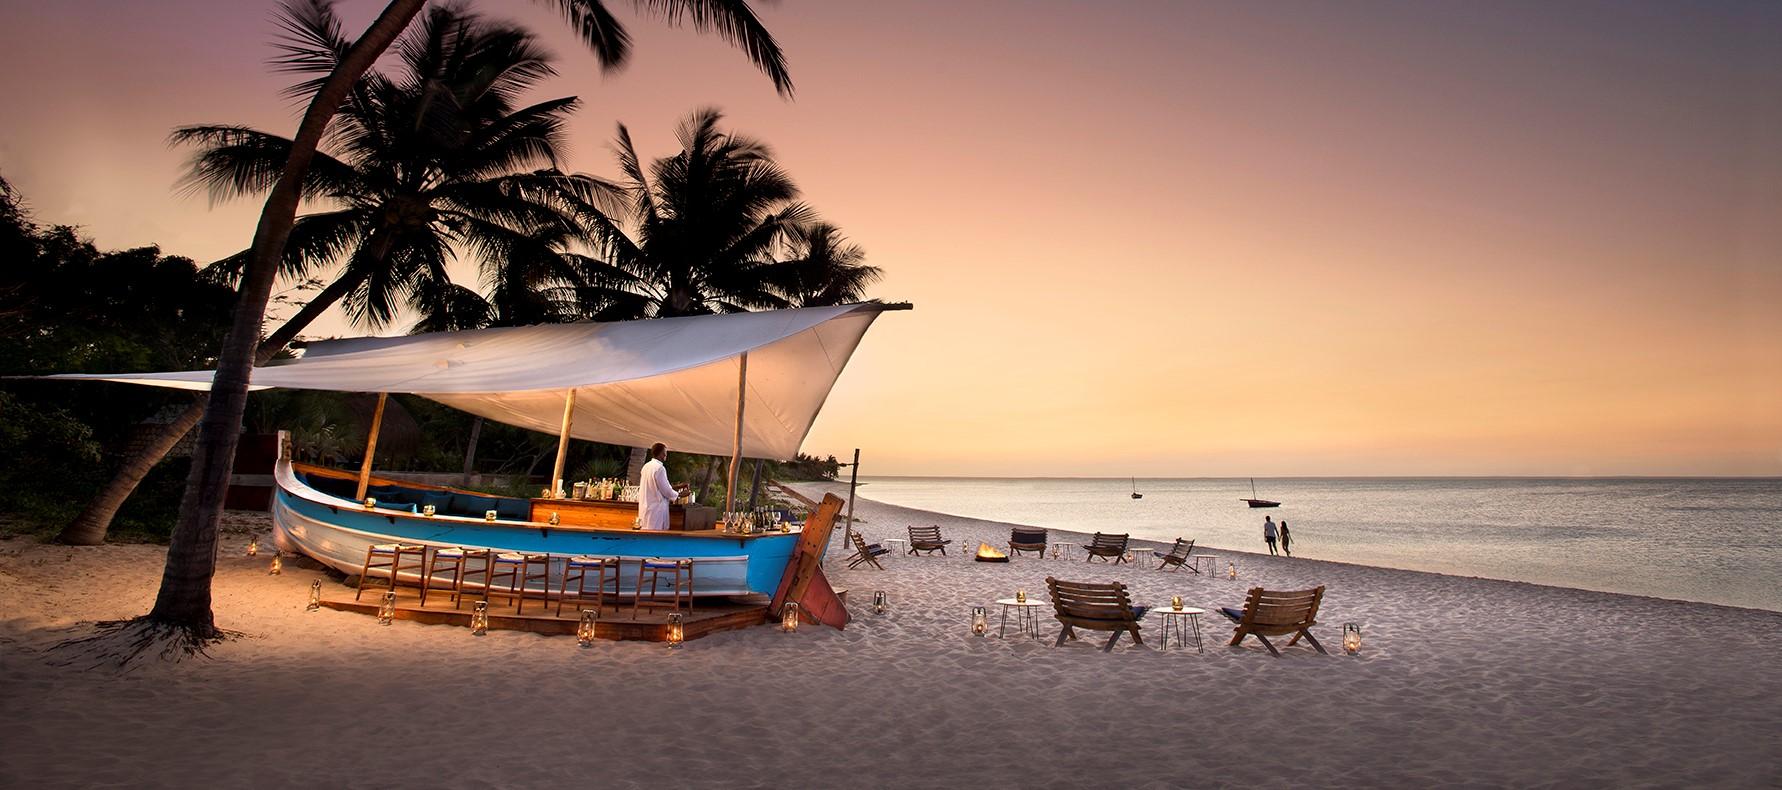 benguerra-island-dhow-beach-bar